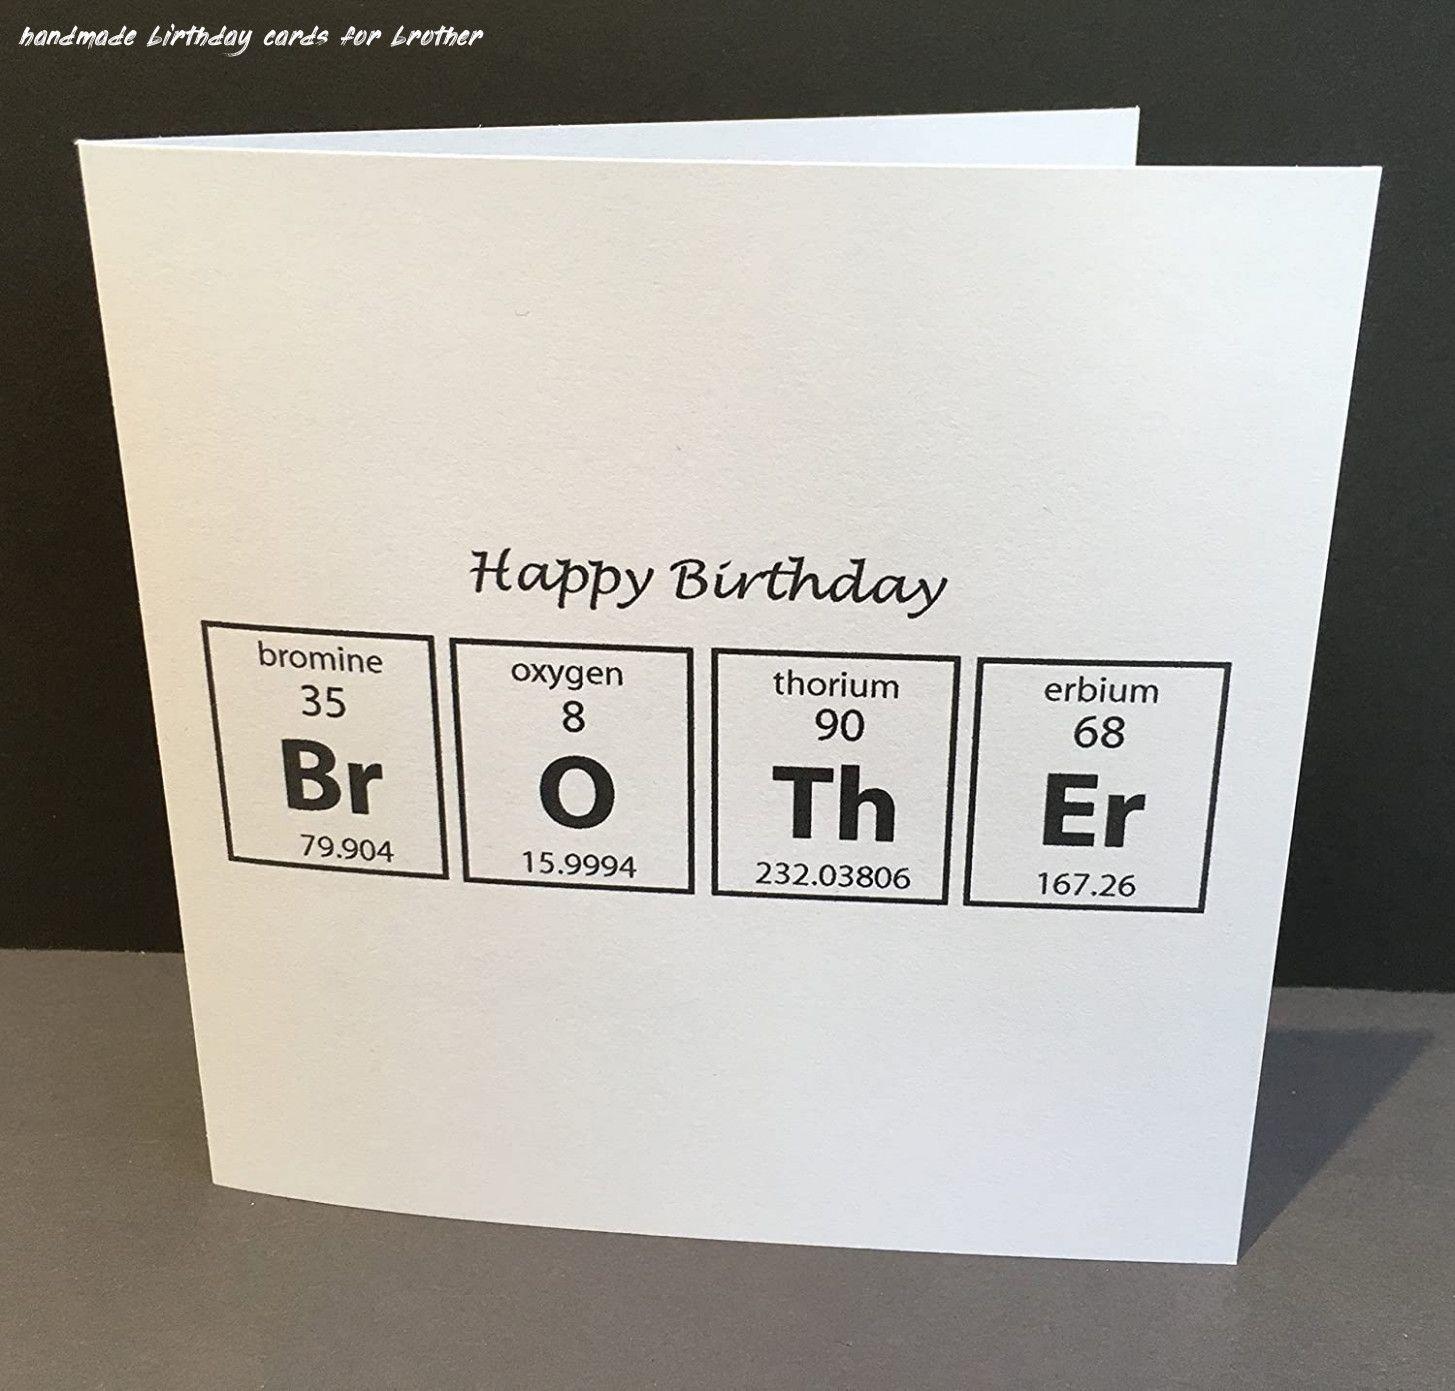 6 Handmade Birthday Cards For Brother Birthday Cards For Brother Funny Brother Birthday Cards Diy Birthday Cards For Brother